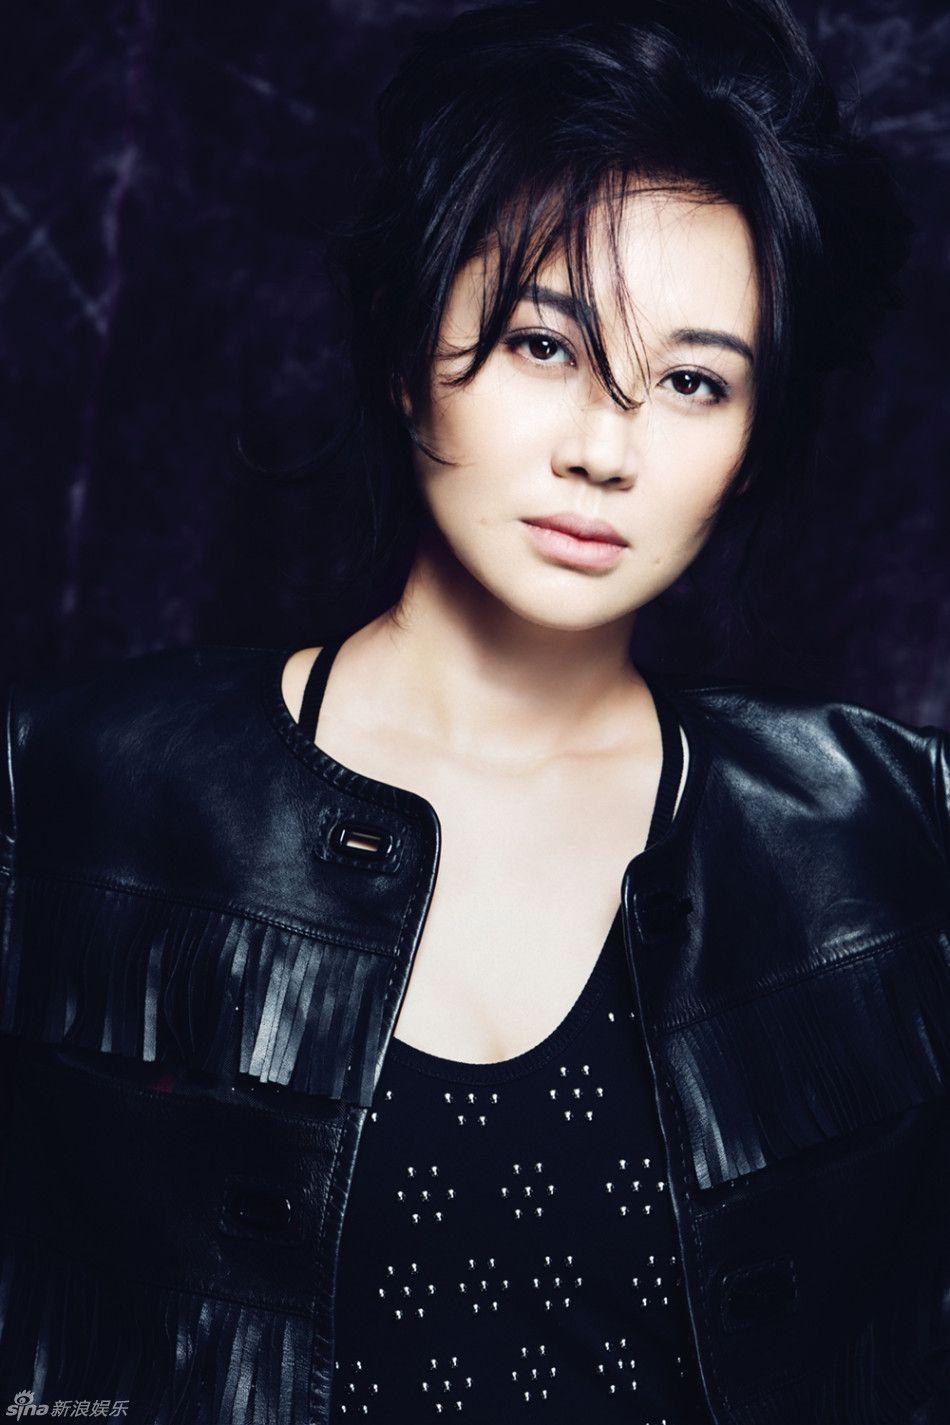 Chinese actress Xu Qing | Chinese actress, Entertainment